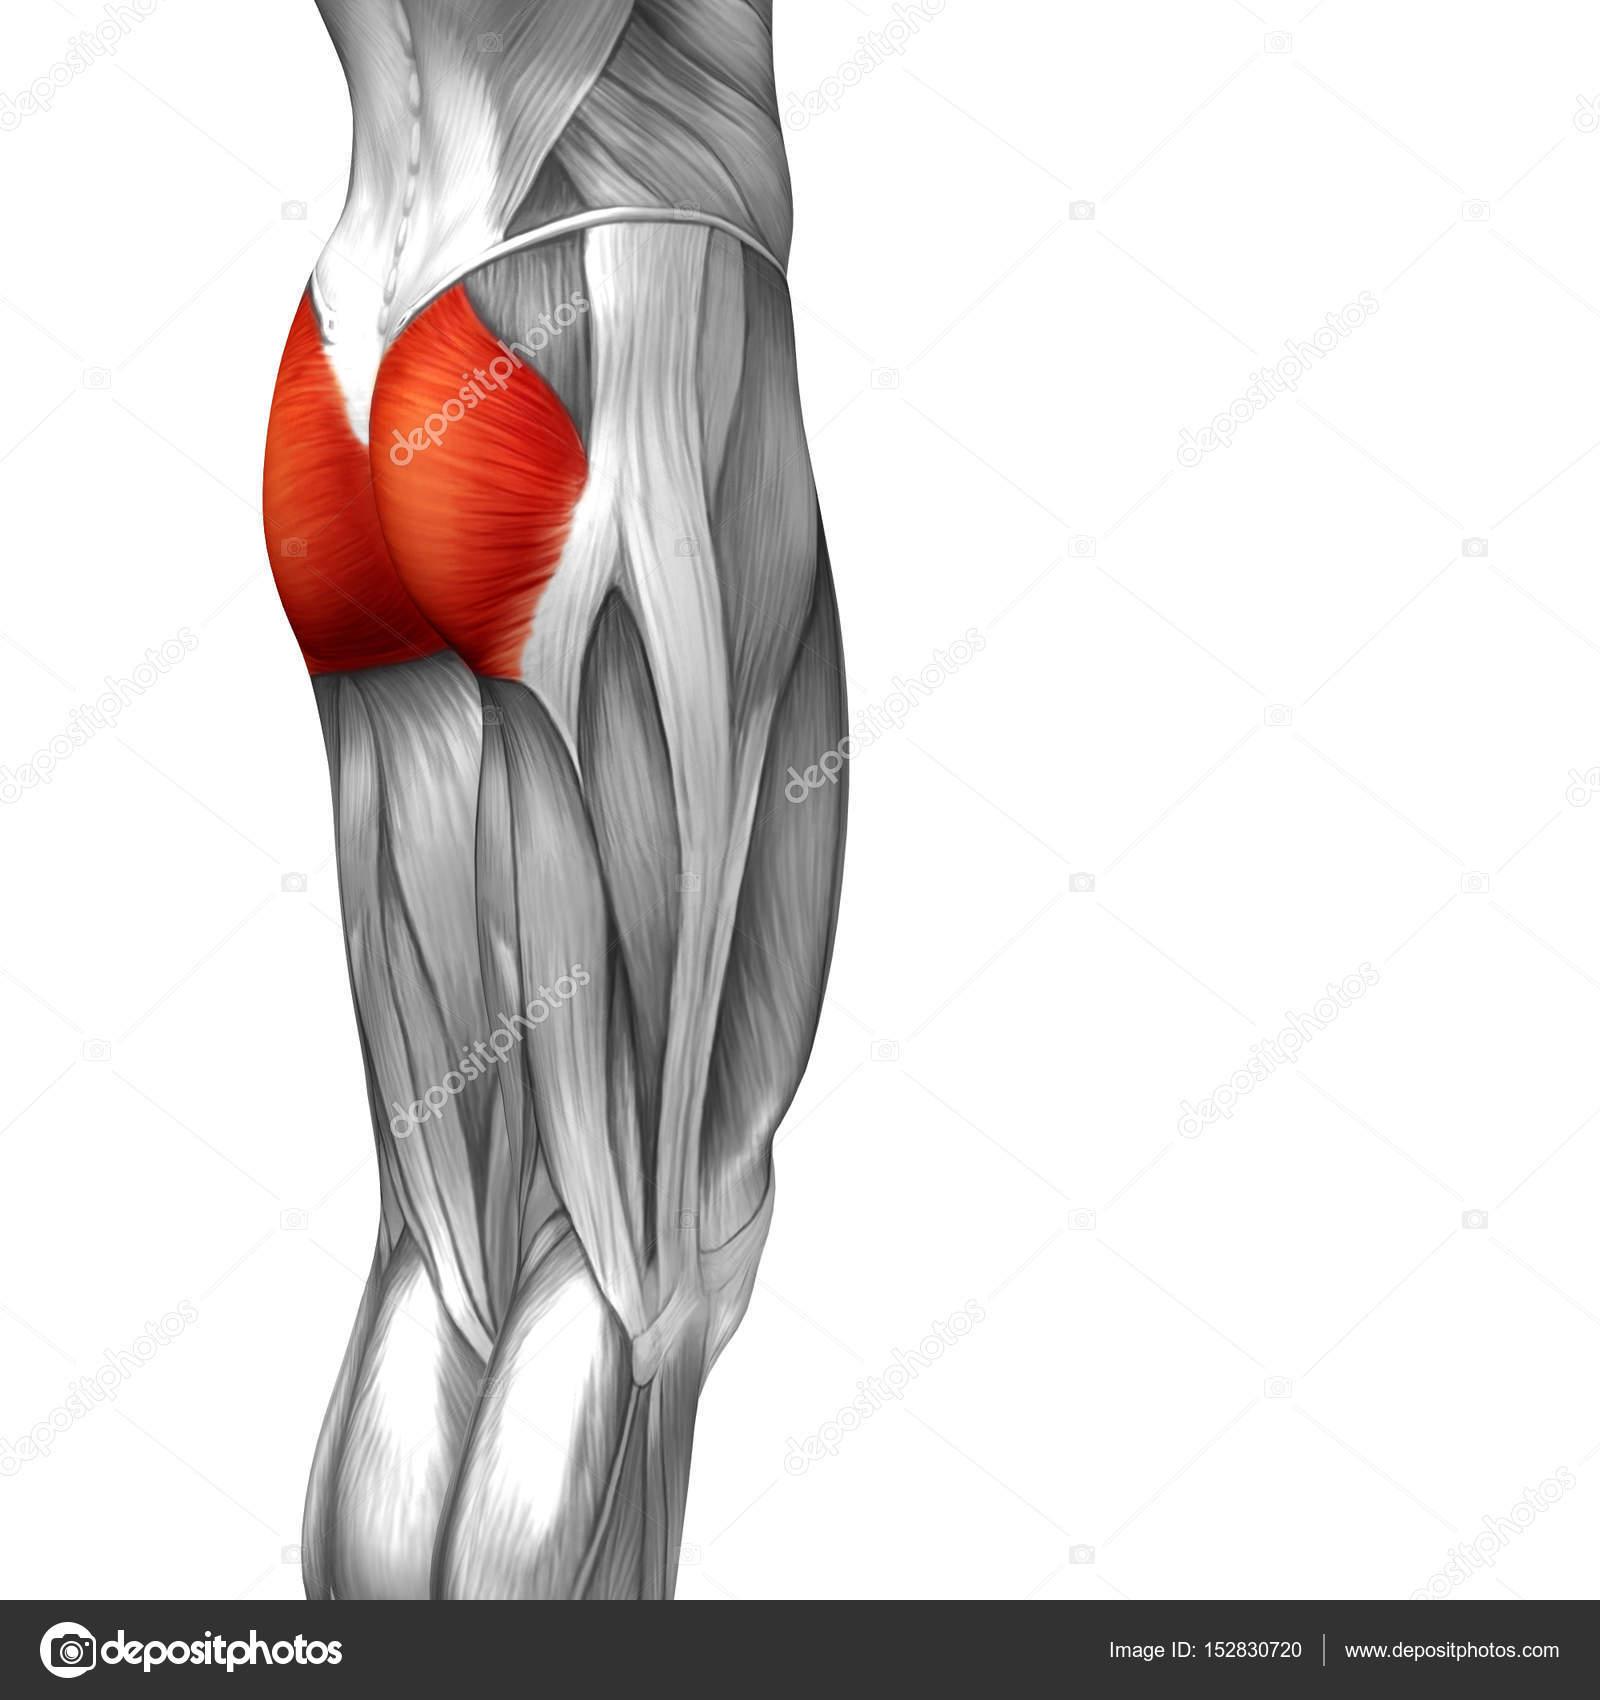 Human Upper Legs Anatomy Stock Photo Design36 152830720